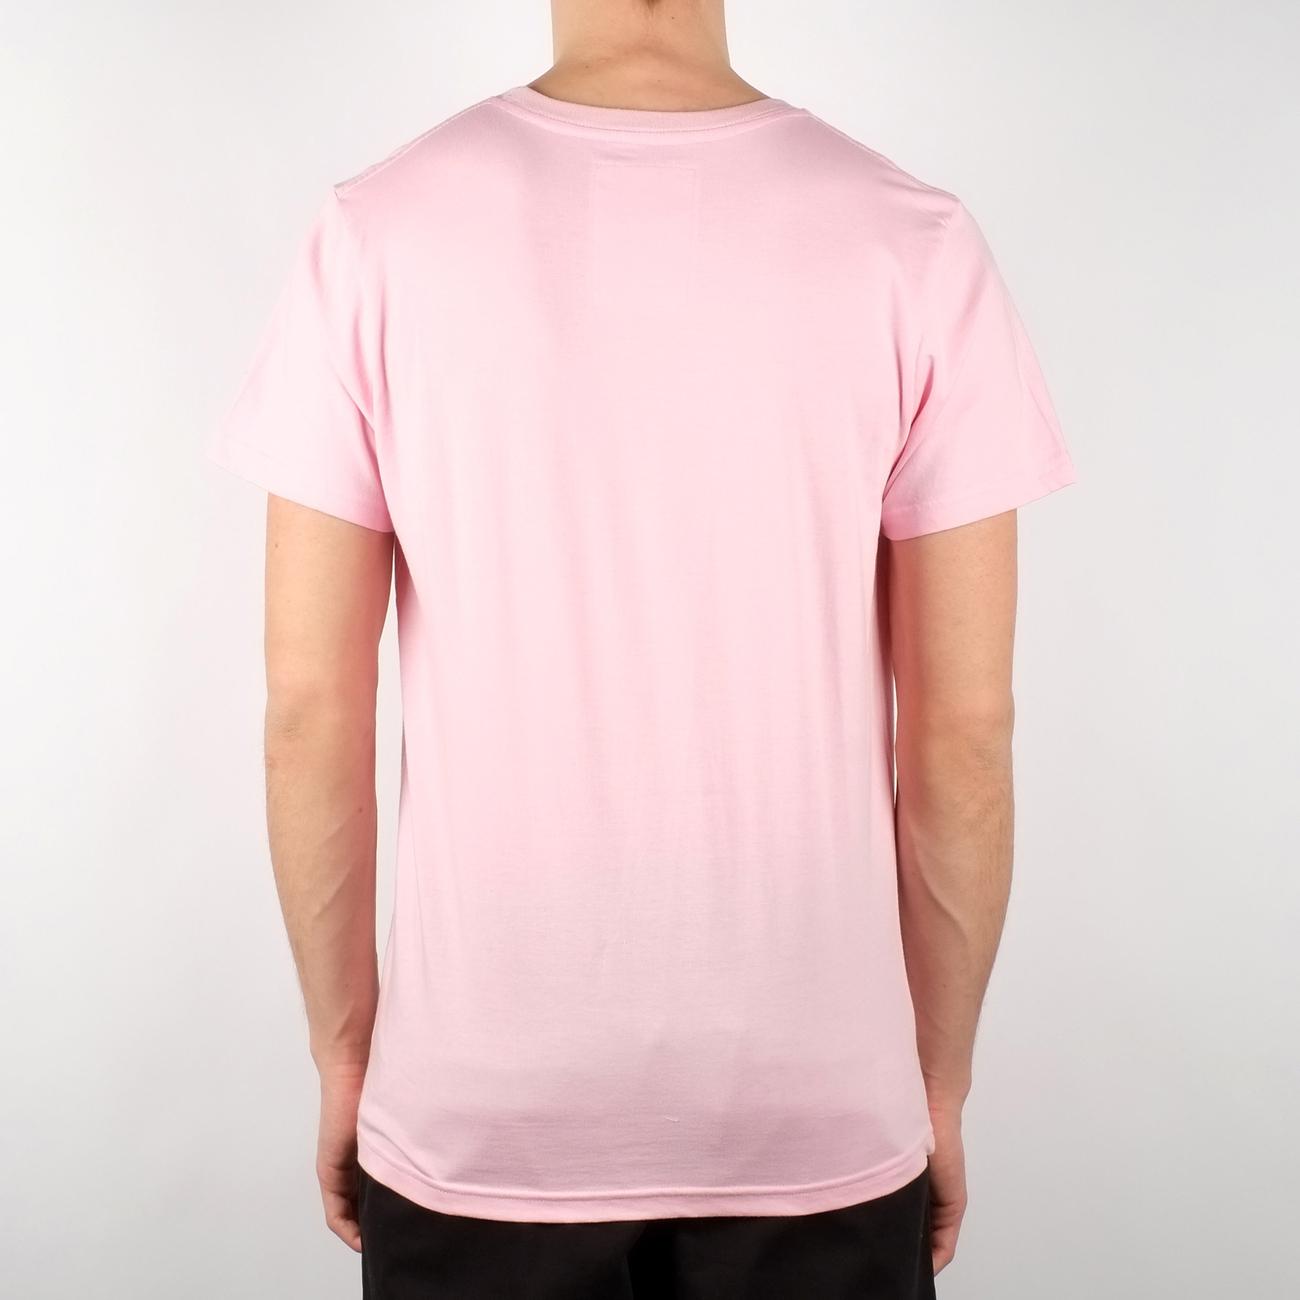 Do Nothing Pink